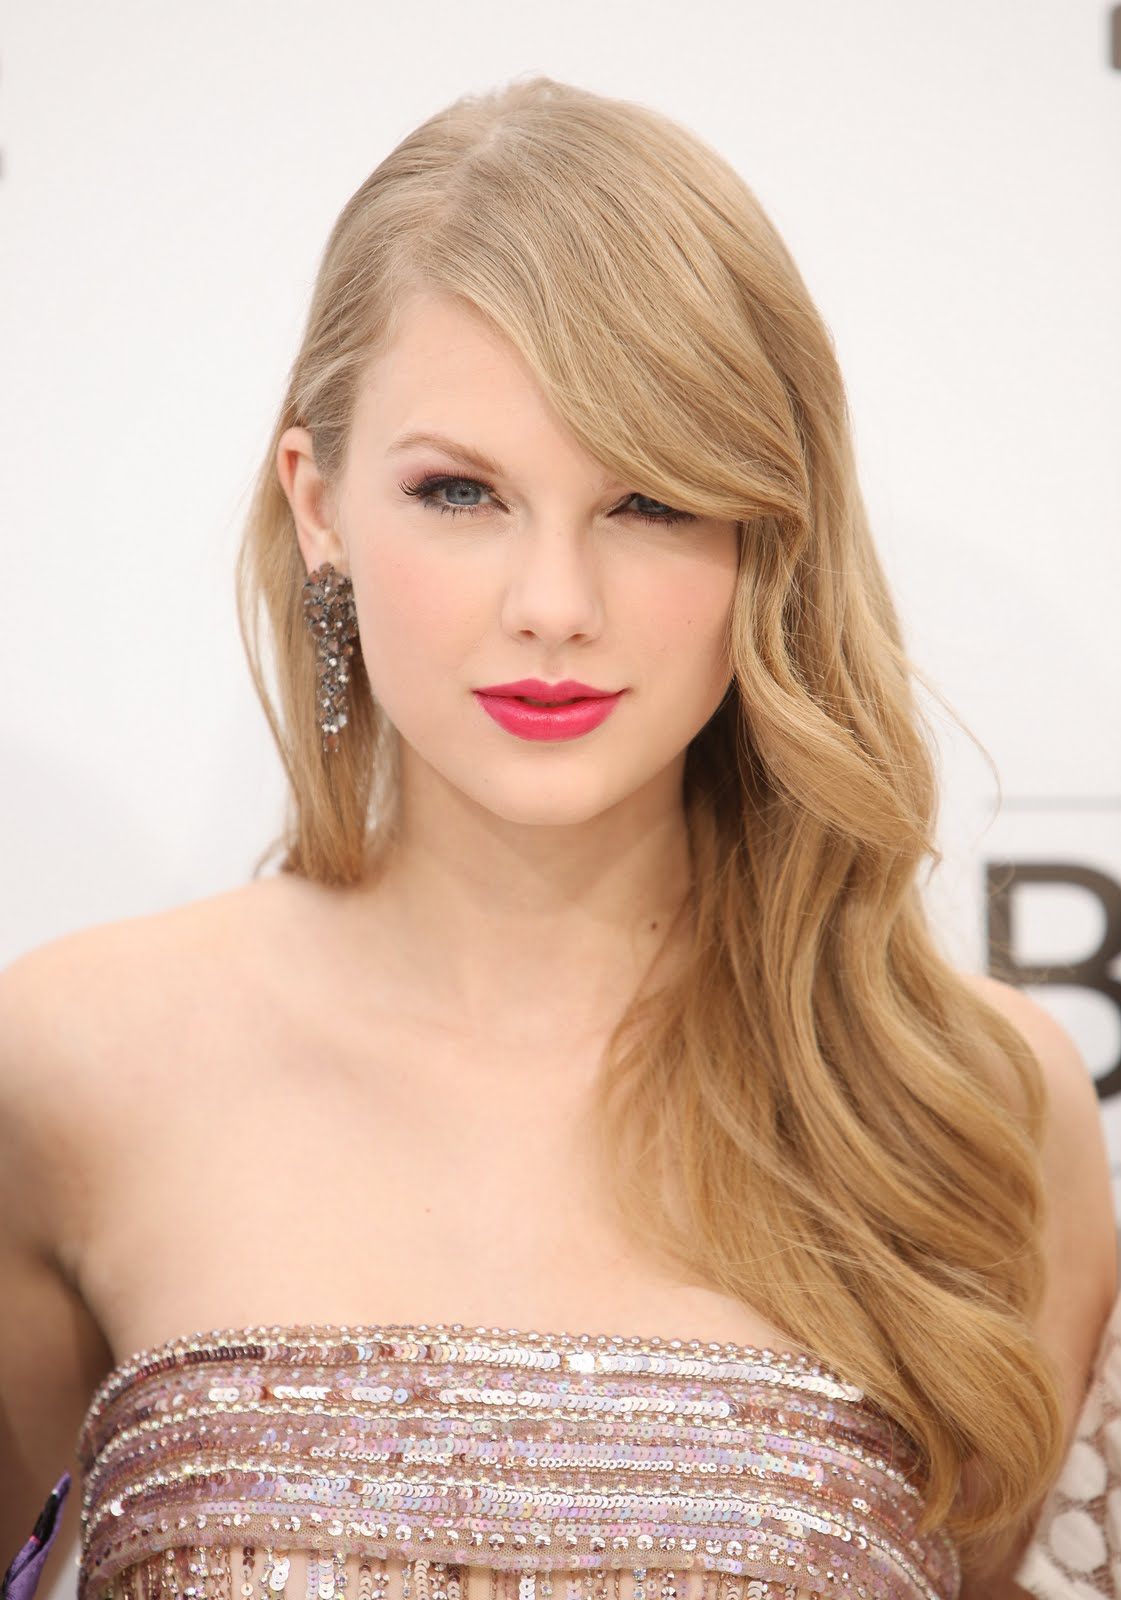 http://1.bp.blogspot.com/-eZTiJLuk34A/TdxV9WmHbOI/AAAAAAAAGMQ/iGHv0JLSQDw/s1600/Taylor_BillboardAwards.jpg